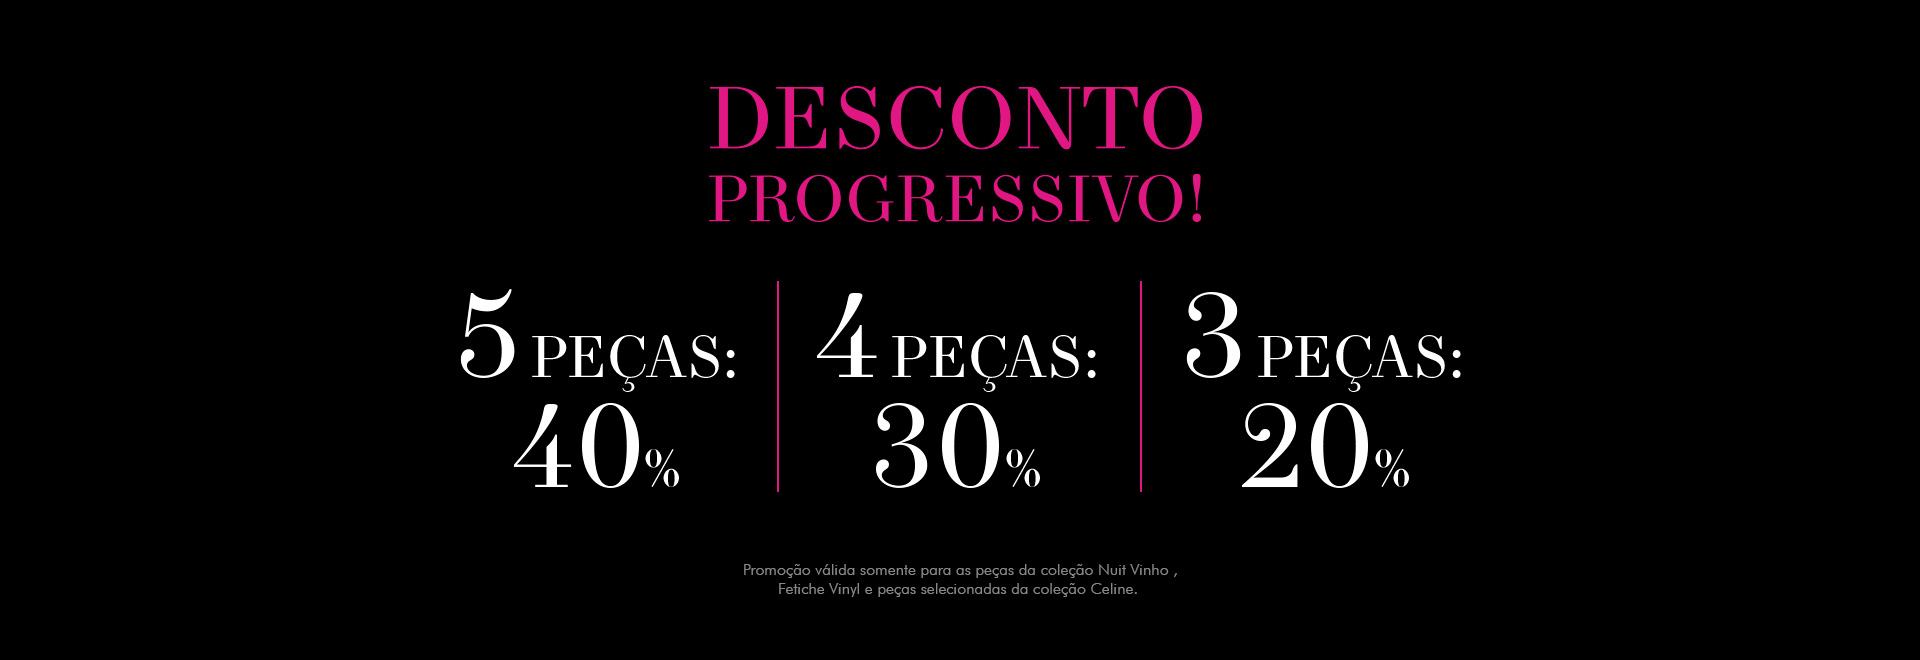 Progressiva